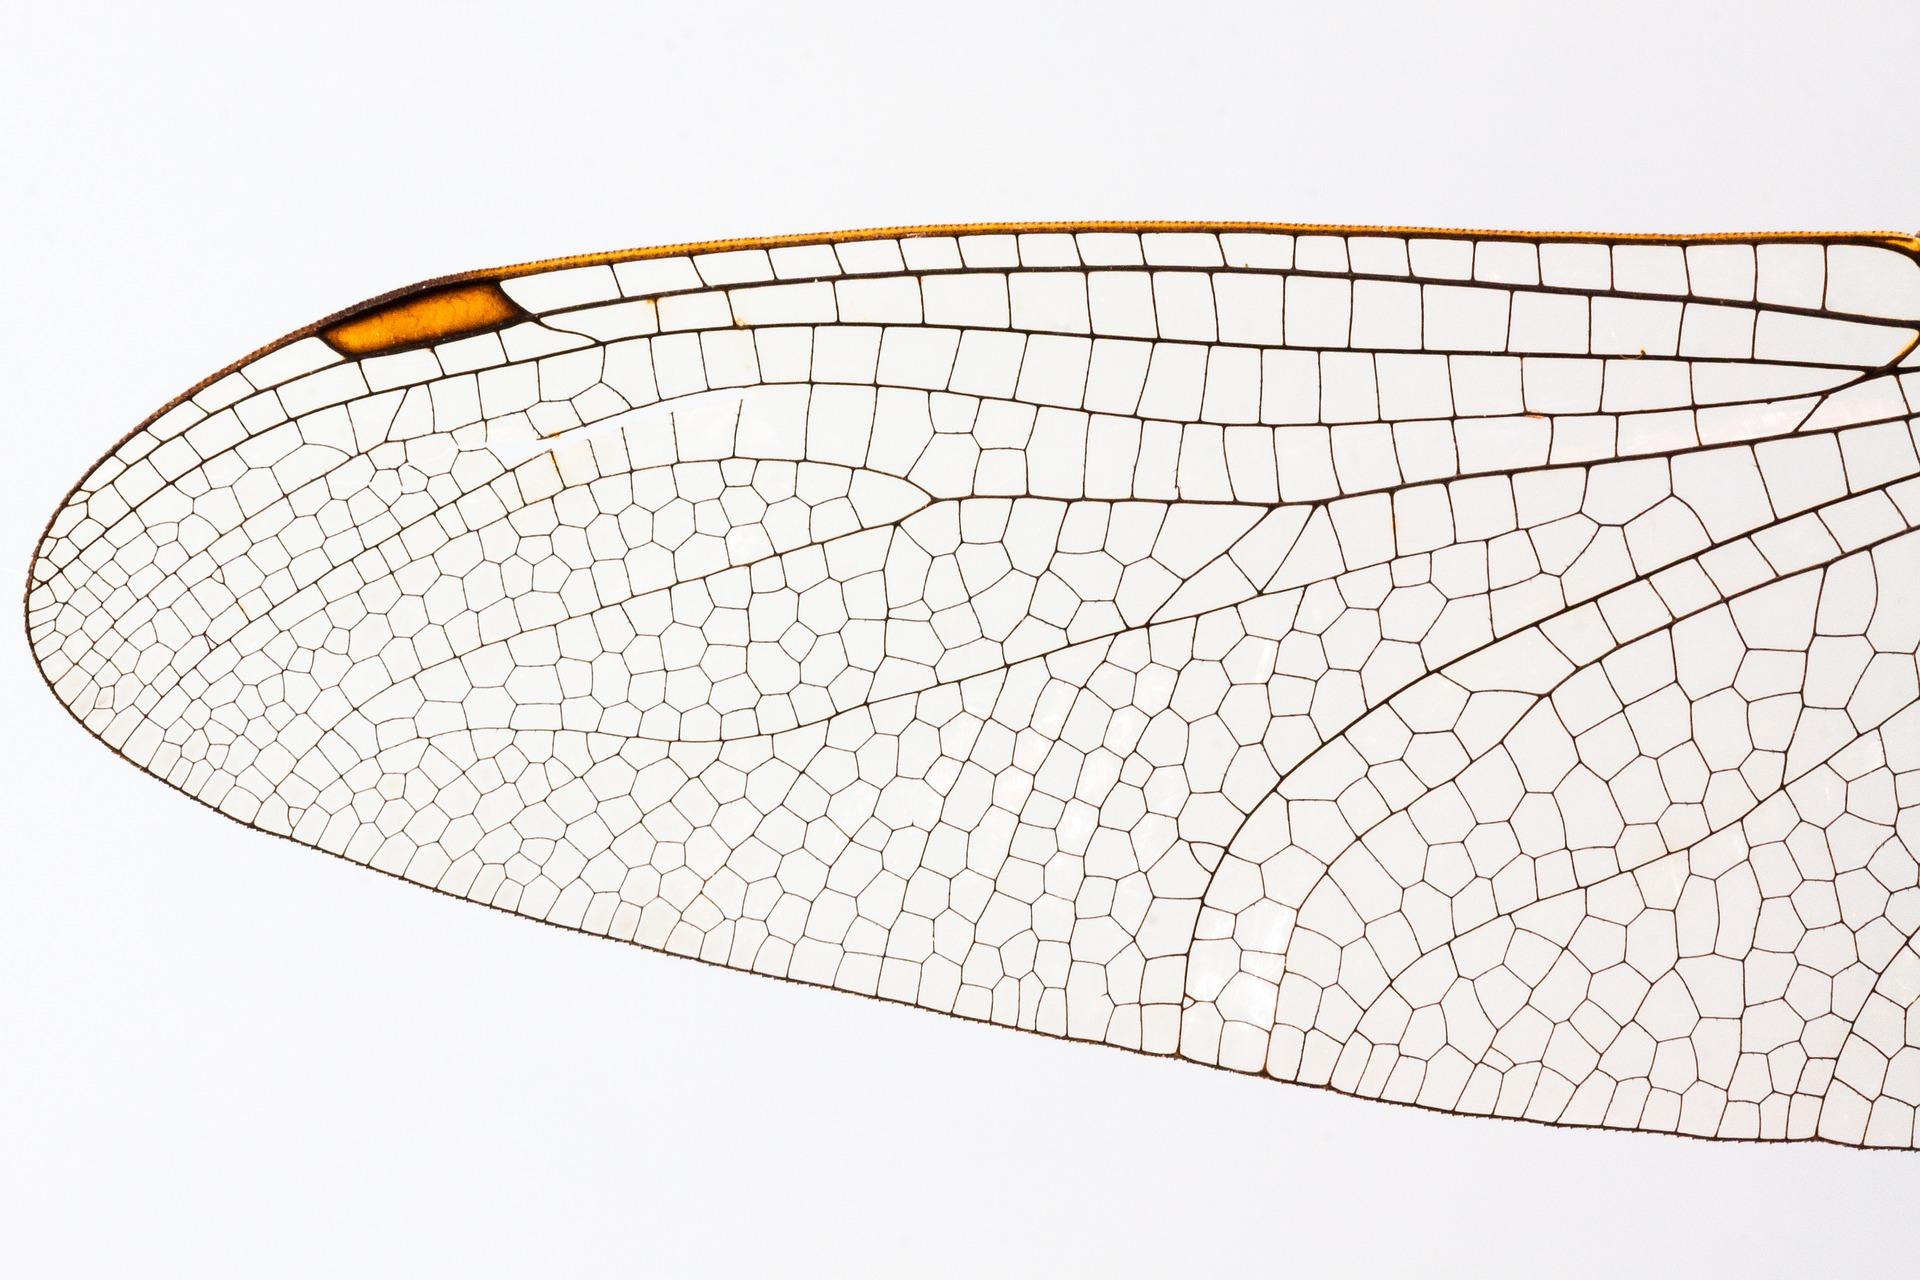 dragonfly-862886_1920